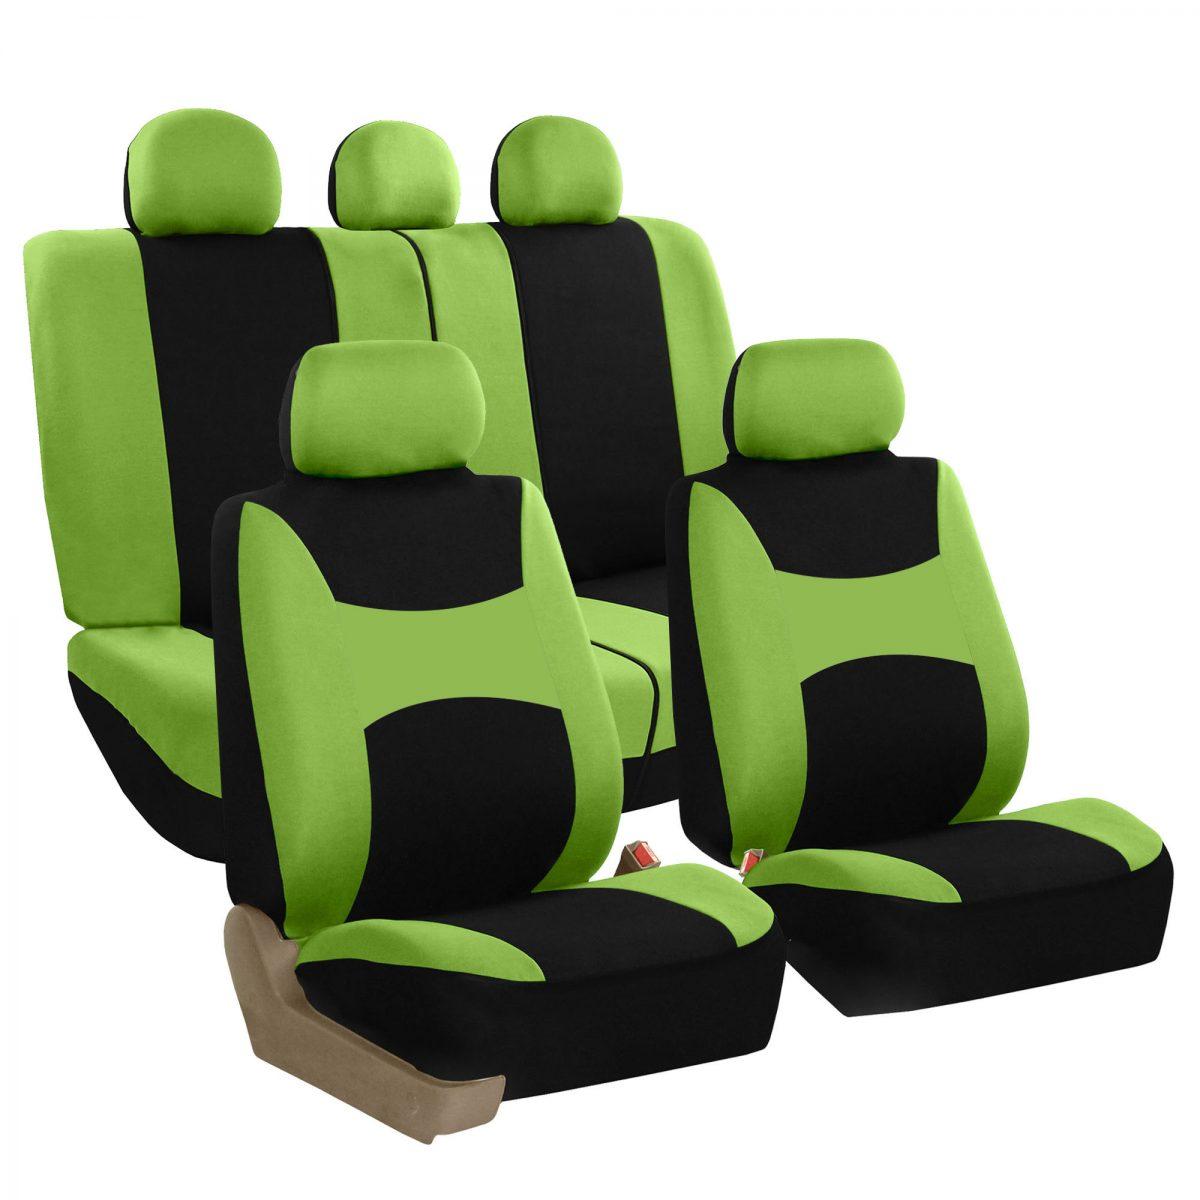 FB030 green full set seat covers